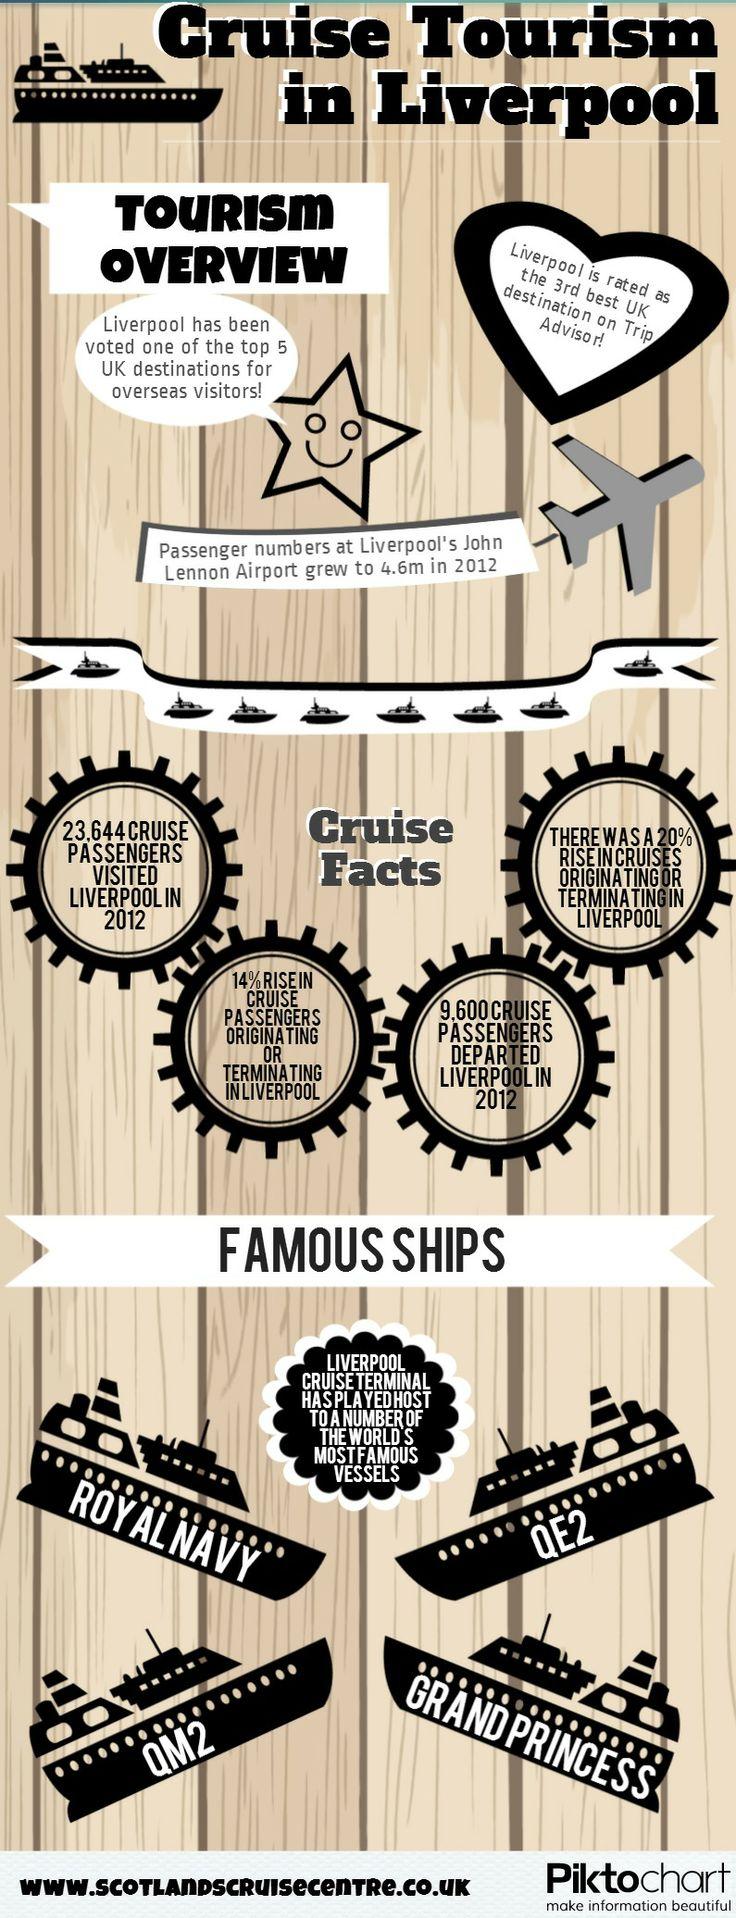 I break down of some of the key statistics regarding #Cruises from #Liverpool. http://www.scotlandscruisecentre.co.uk/cruise-menu/regional-flights/fly-cruises-from-liverpool/